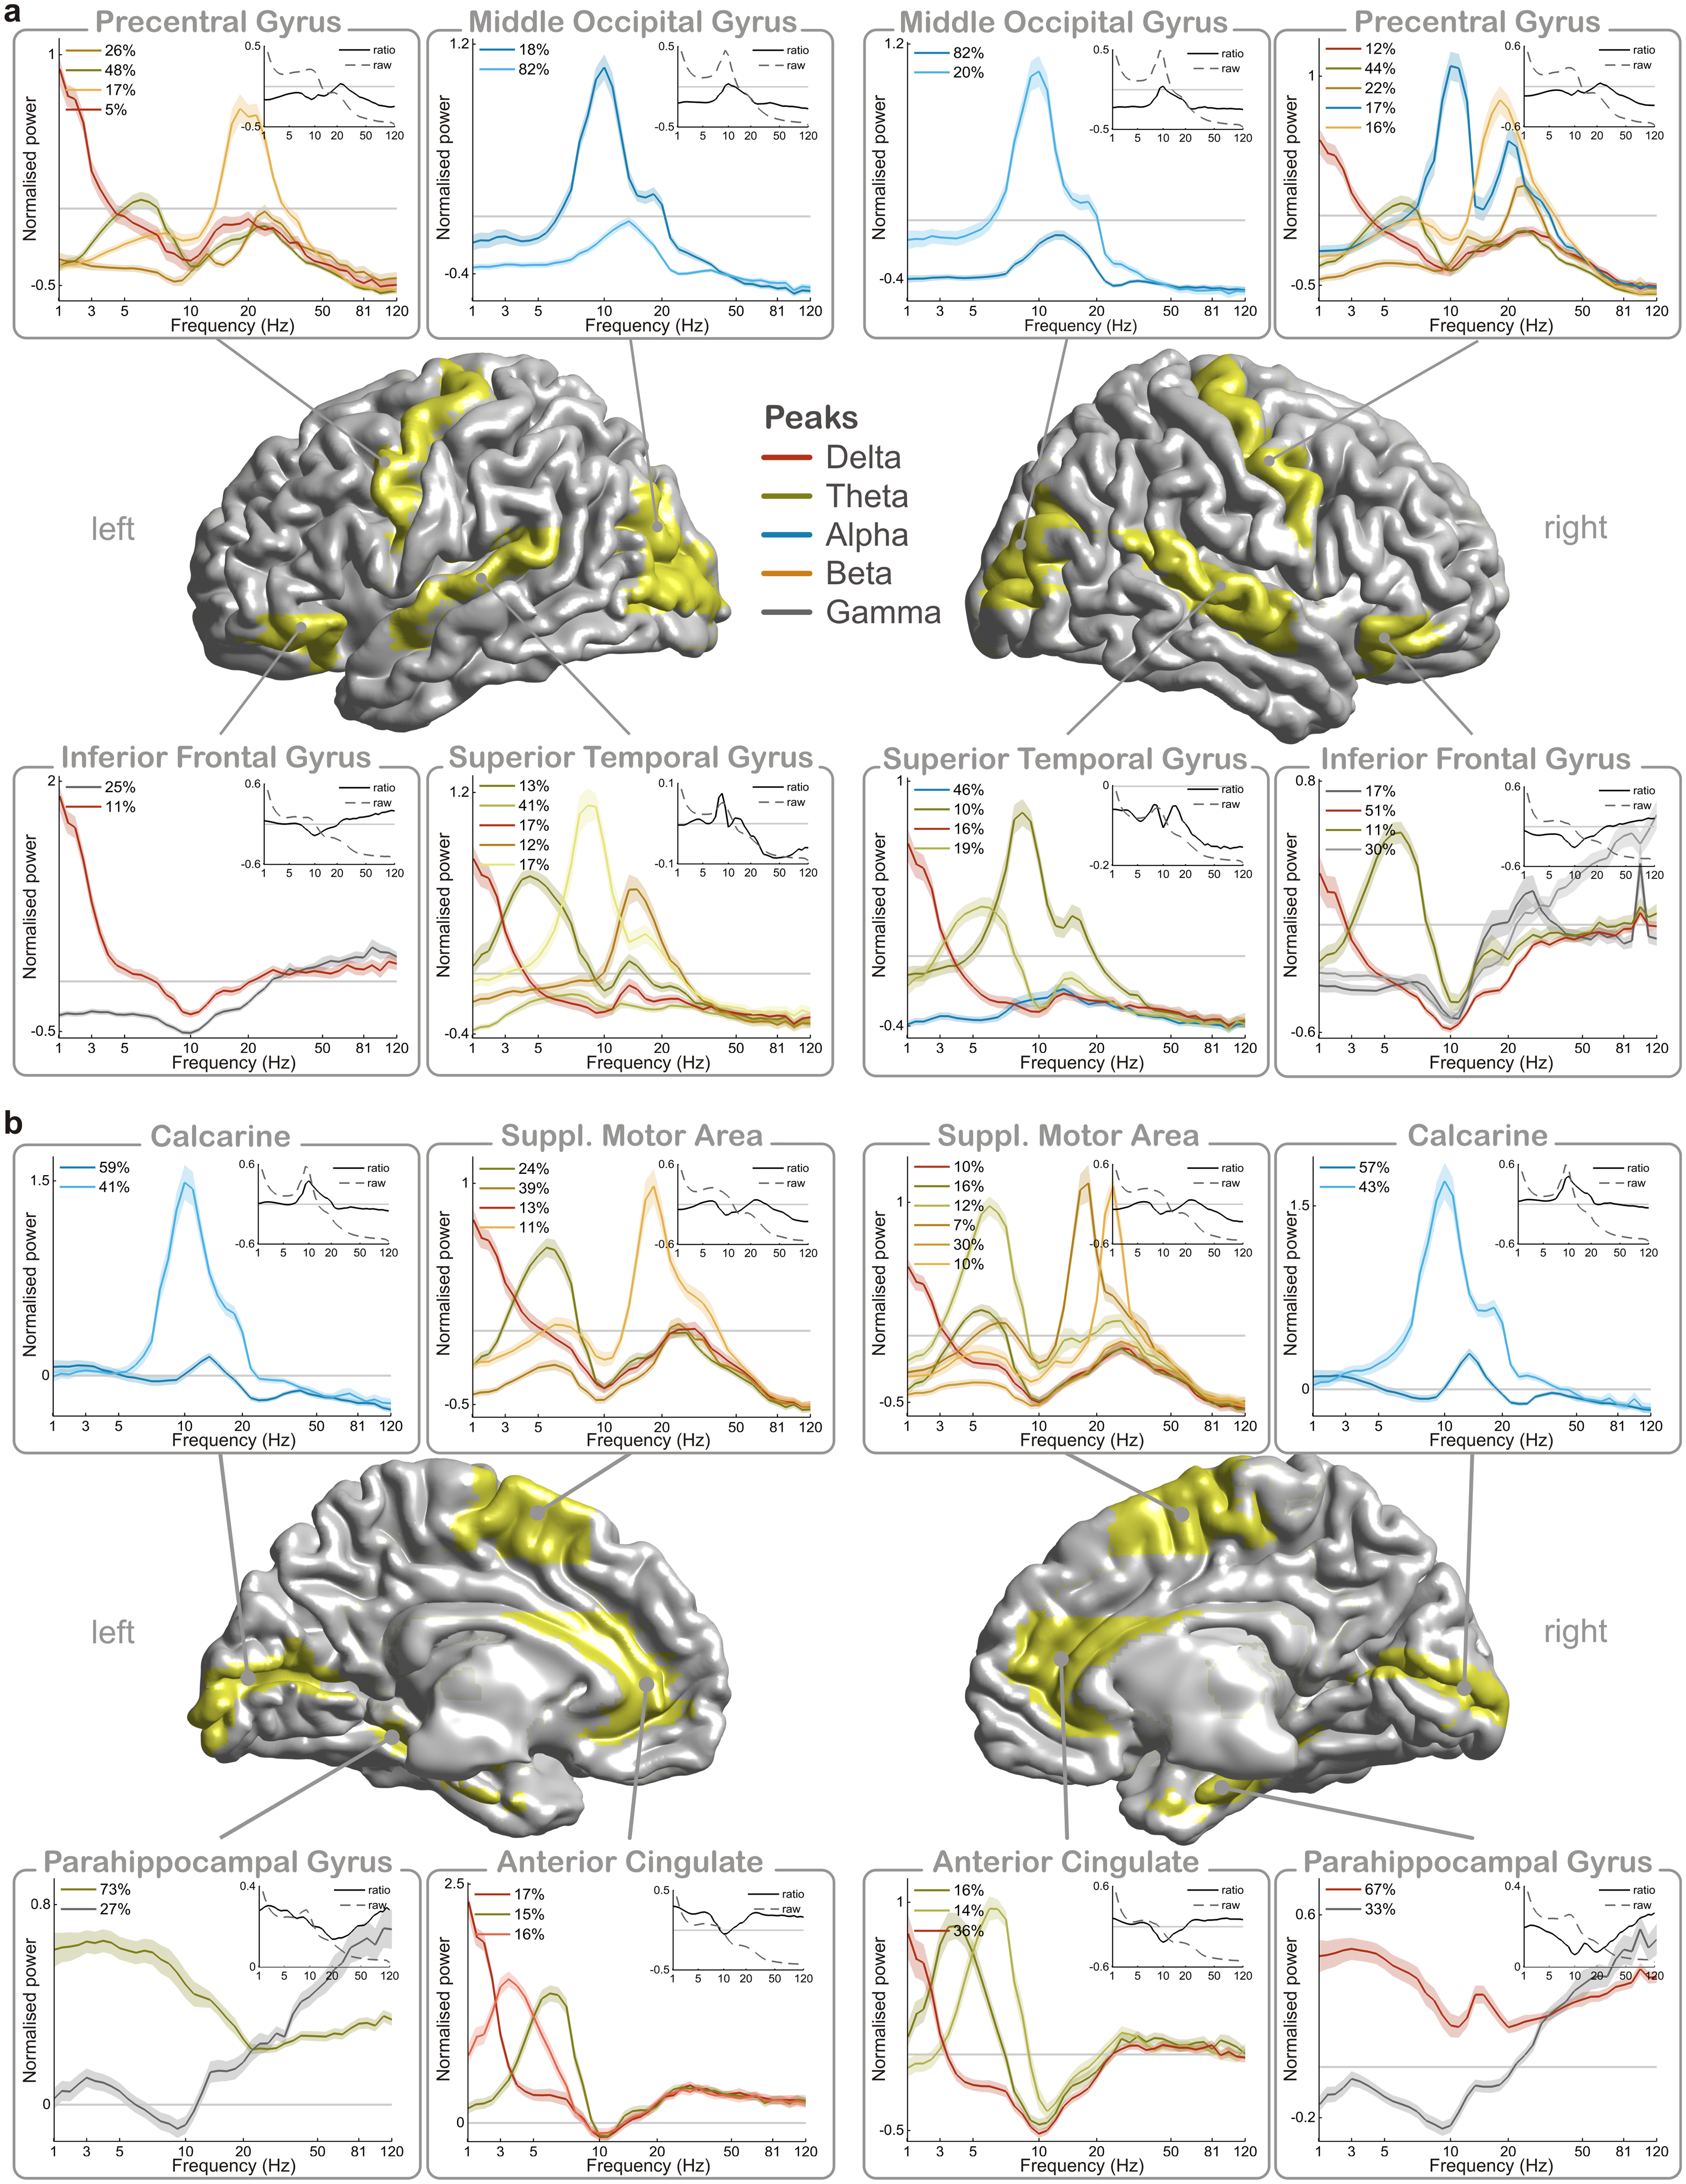 @wef : Each part of your brain has its own rhythmic fingerprint' https://t.co/IHLEXkvsbo https://t.co/ywTQ19x0fD